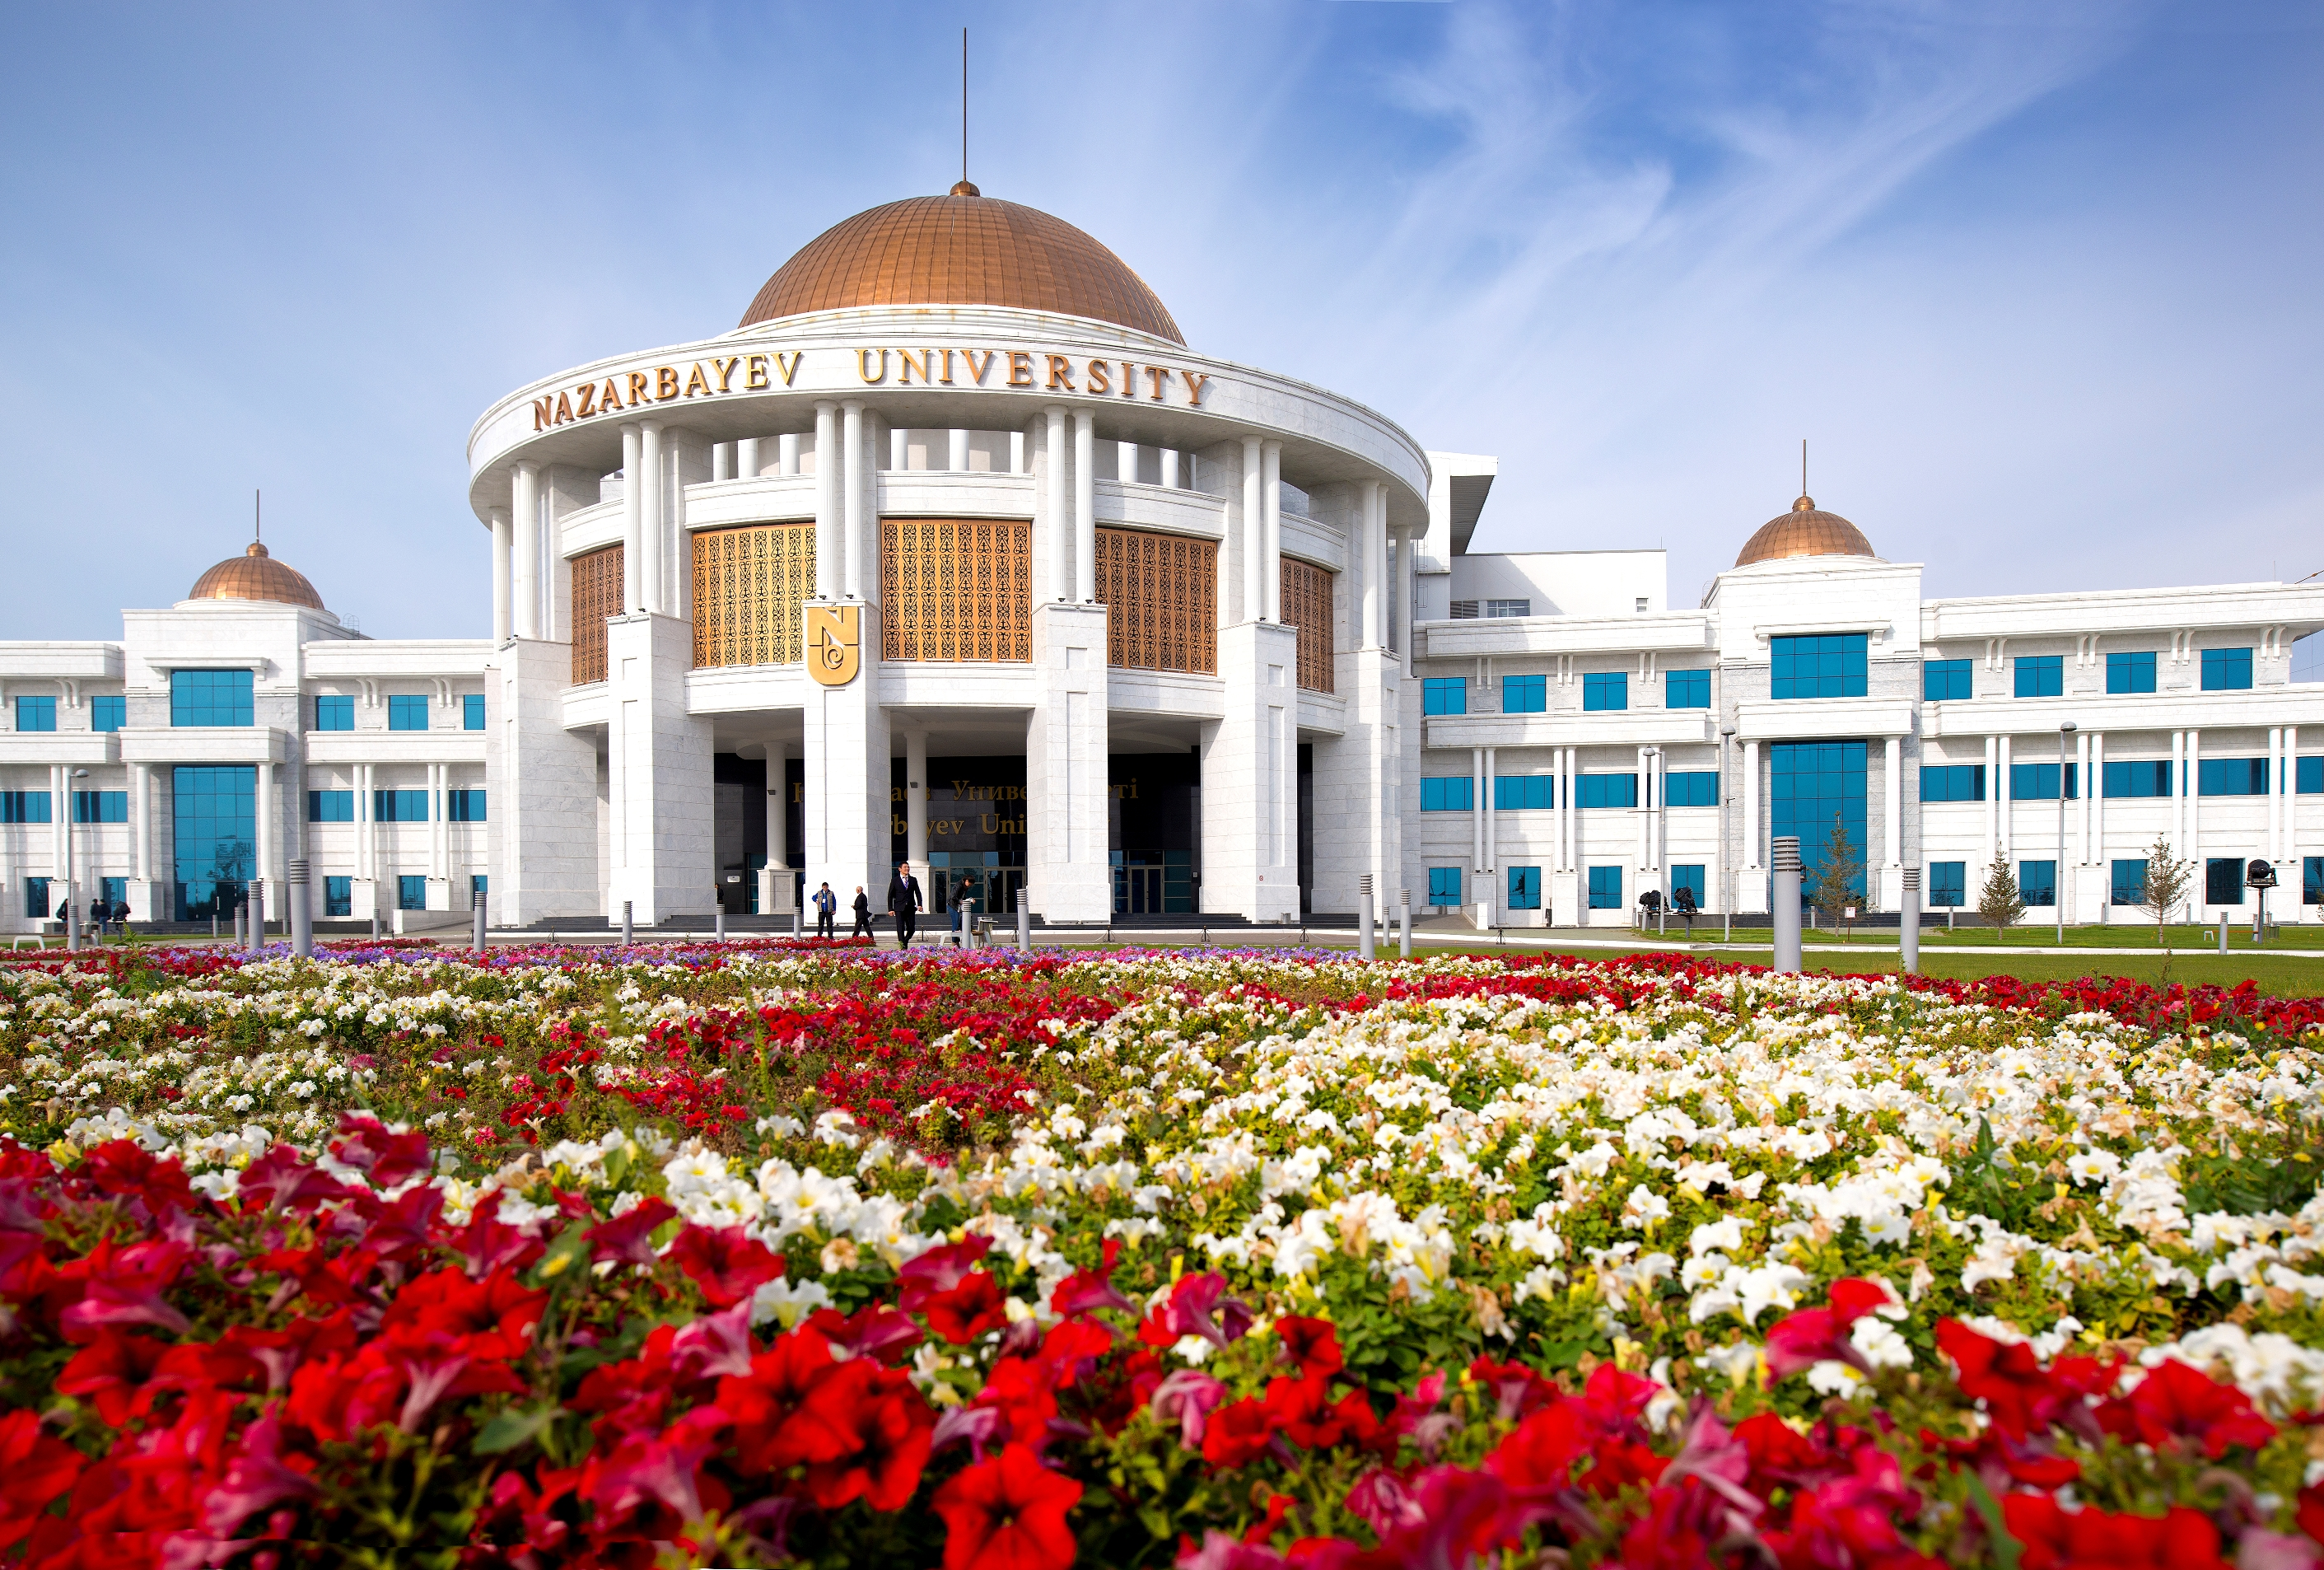 NAZARBAYEV_UNIVERSITY_KAZAKHSTAN_EXT_20140925_9140